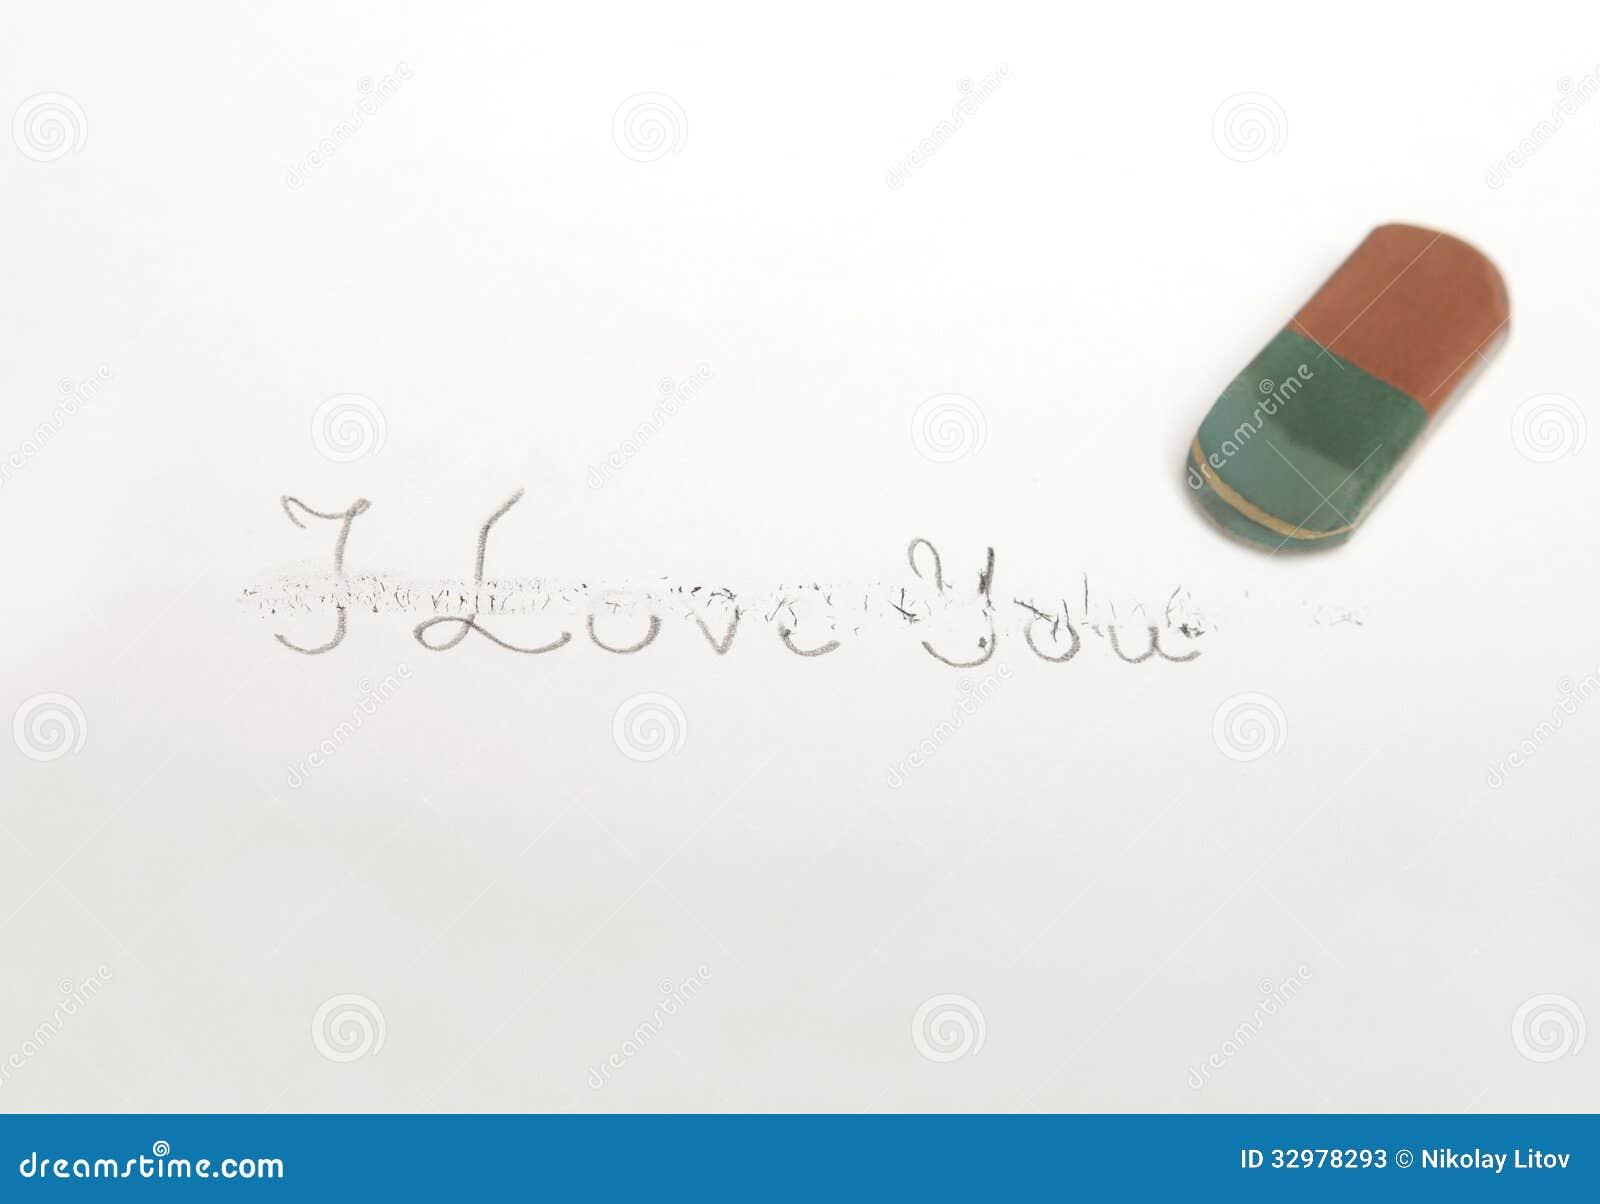 Ti amo Erase